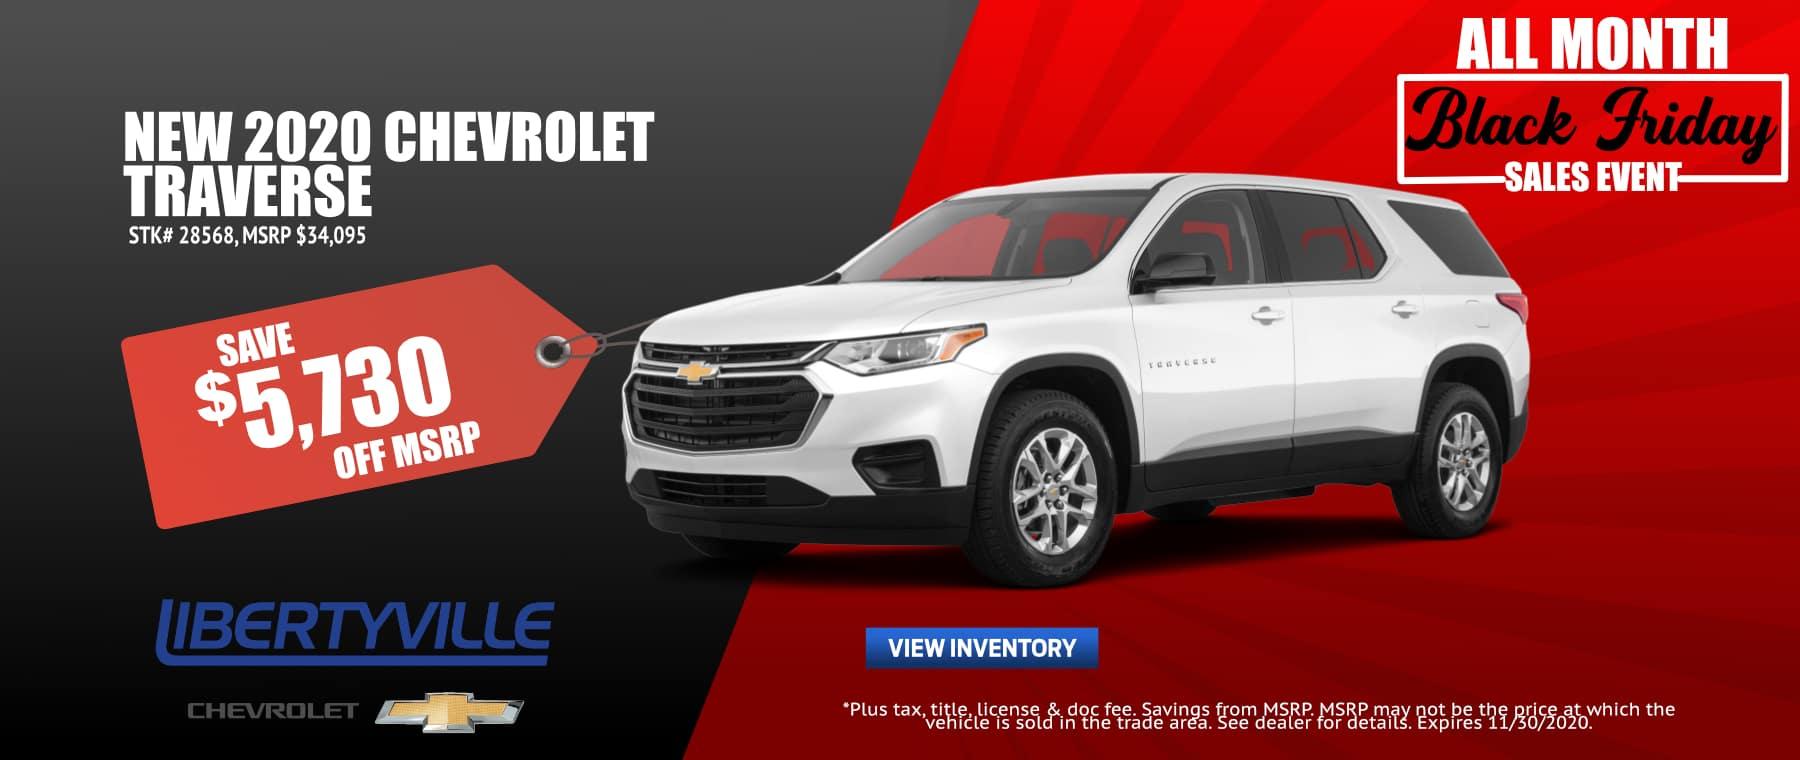 November-2020_Traverse_LIbertyville Chevrolet